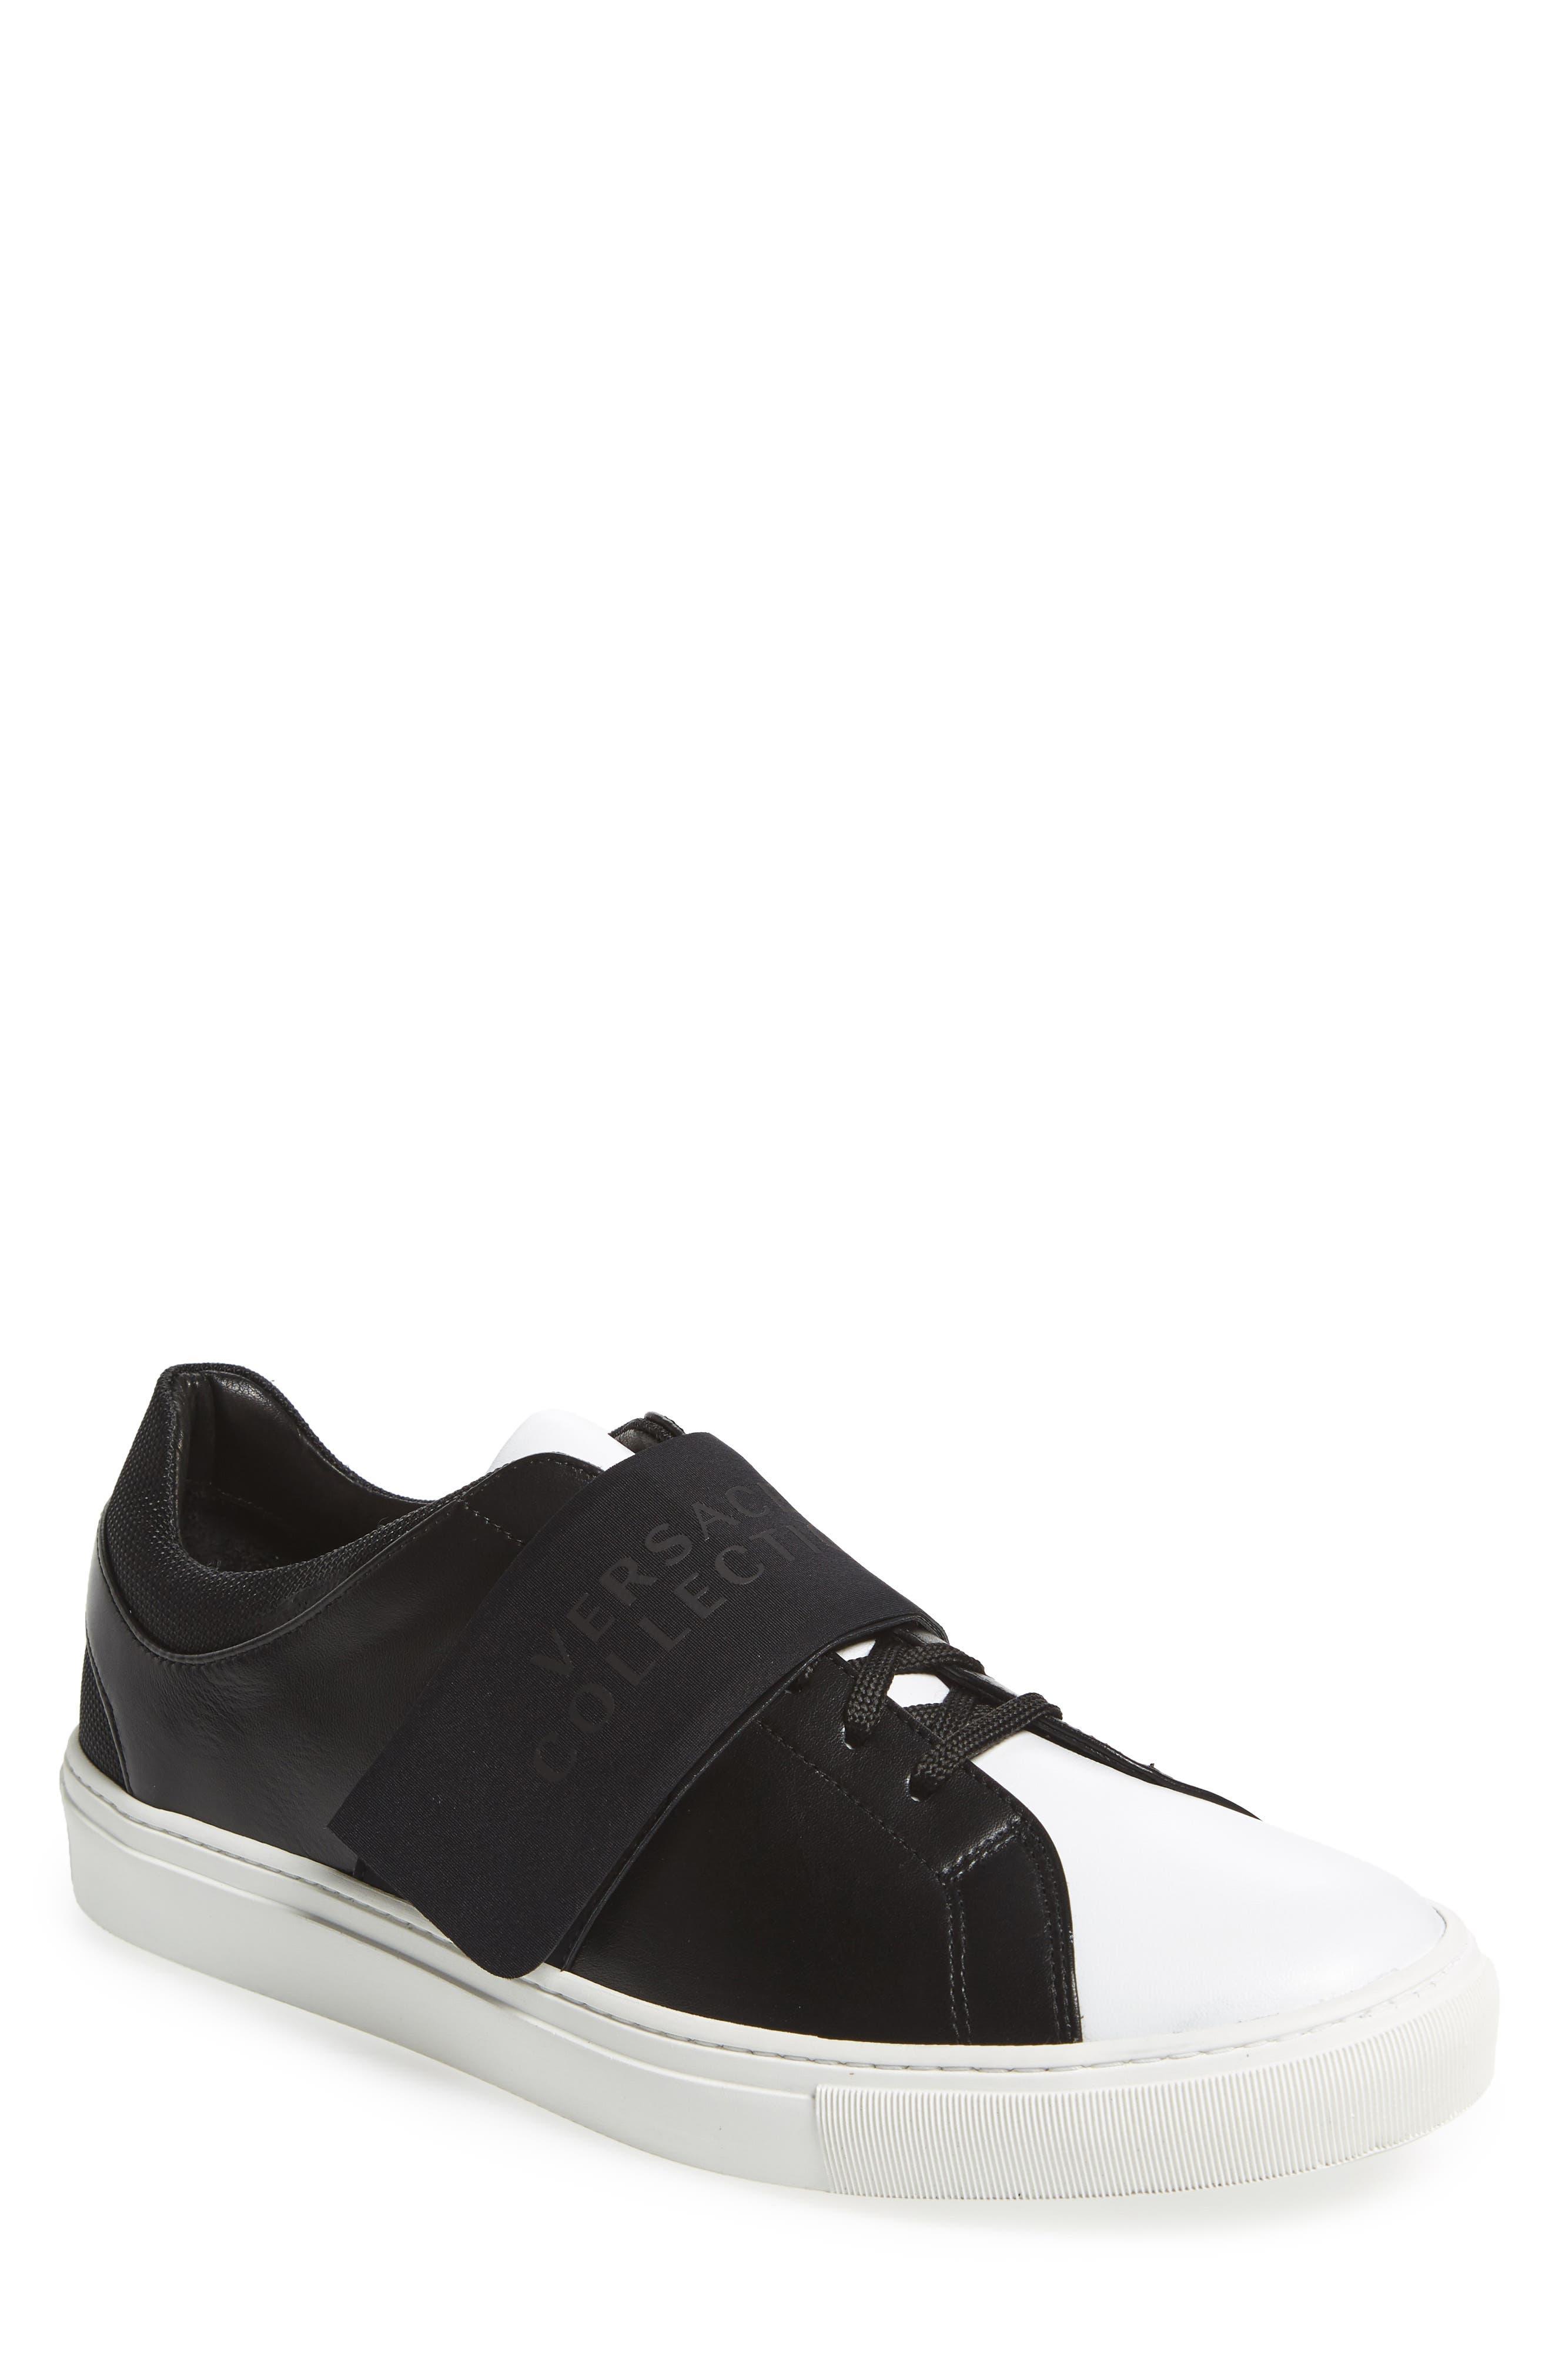 Strap Sneaker,                             Main thumbnail 1, color,                             Bianco/ Nero Leather